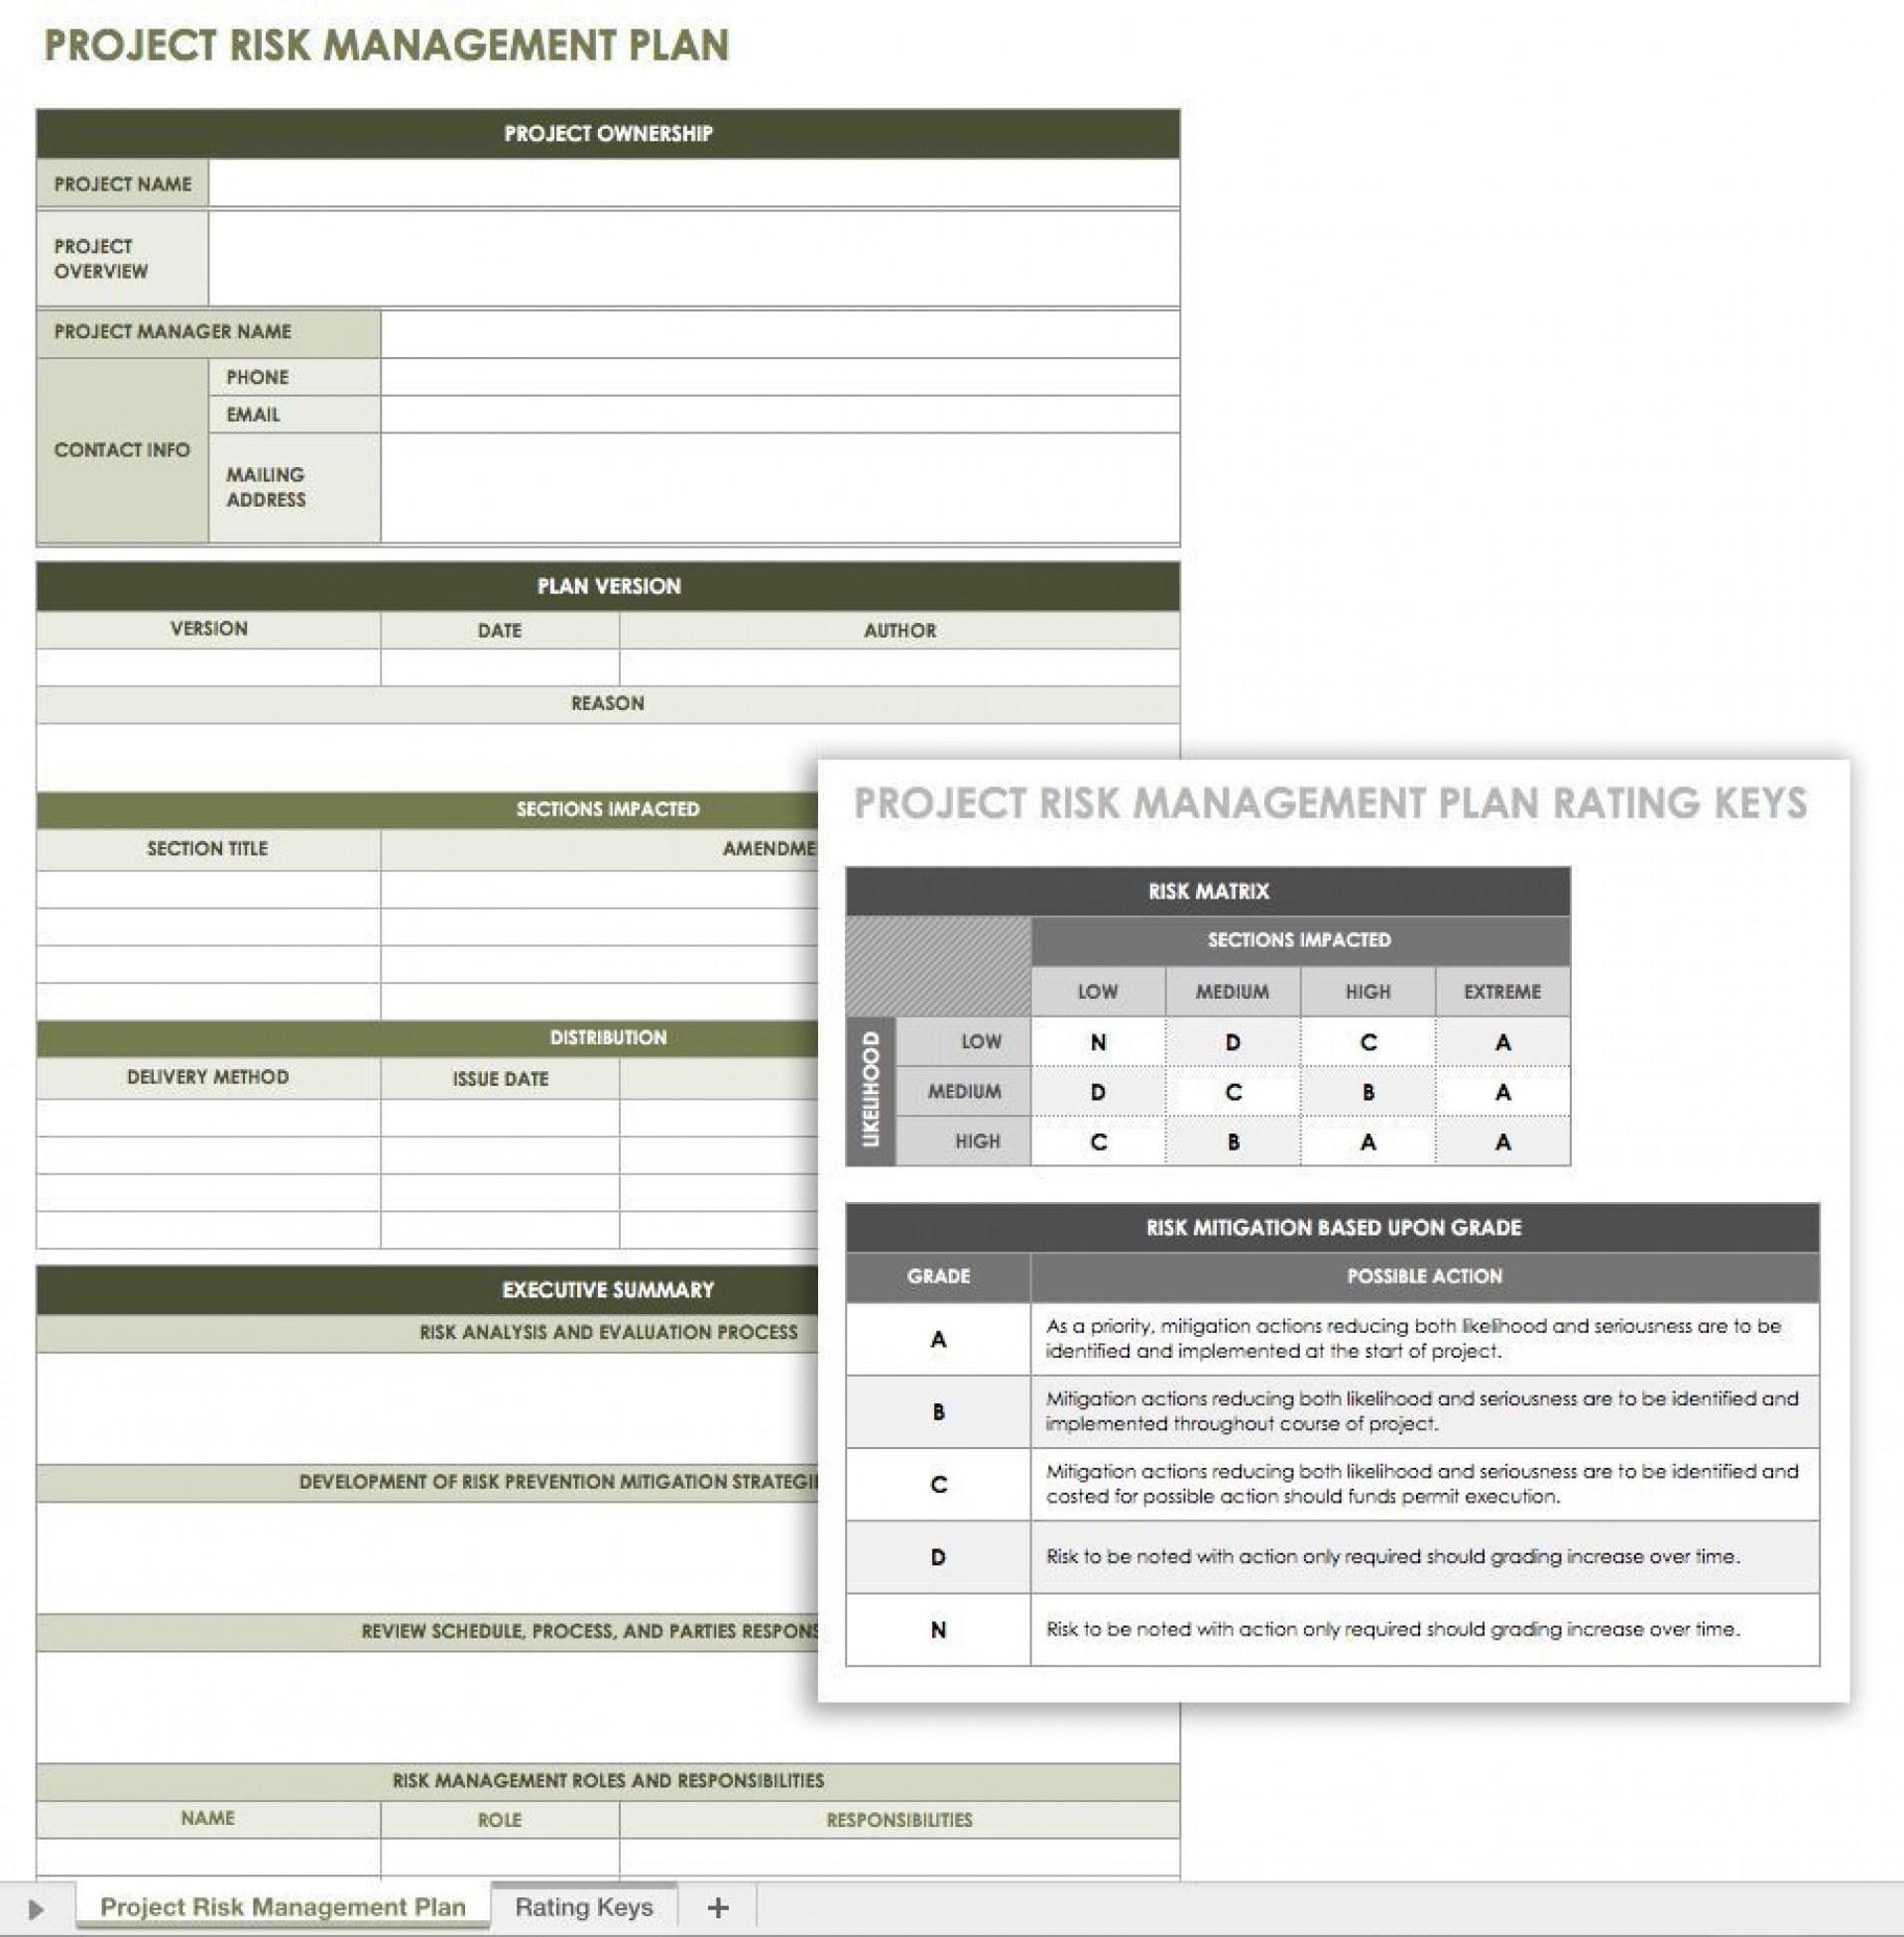 004 Sensational Project Risk Management Plan Template Excel Free Concept 1920